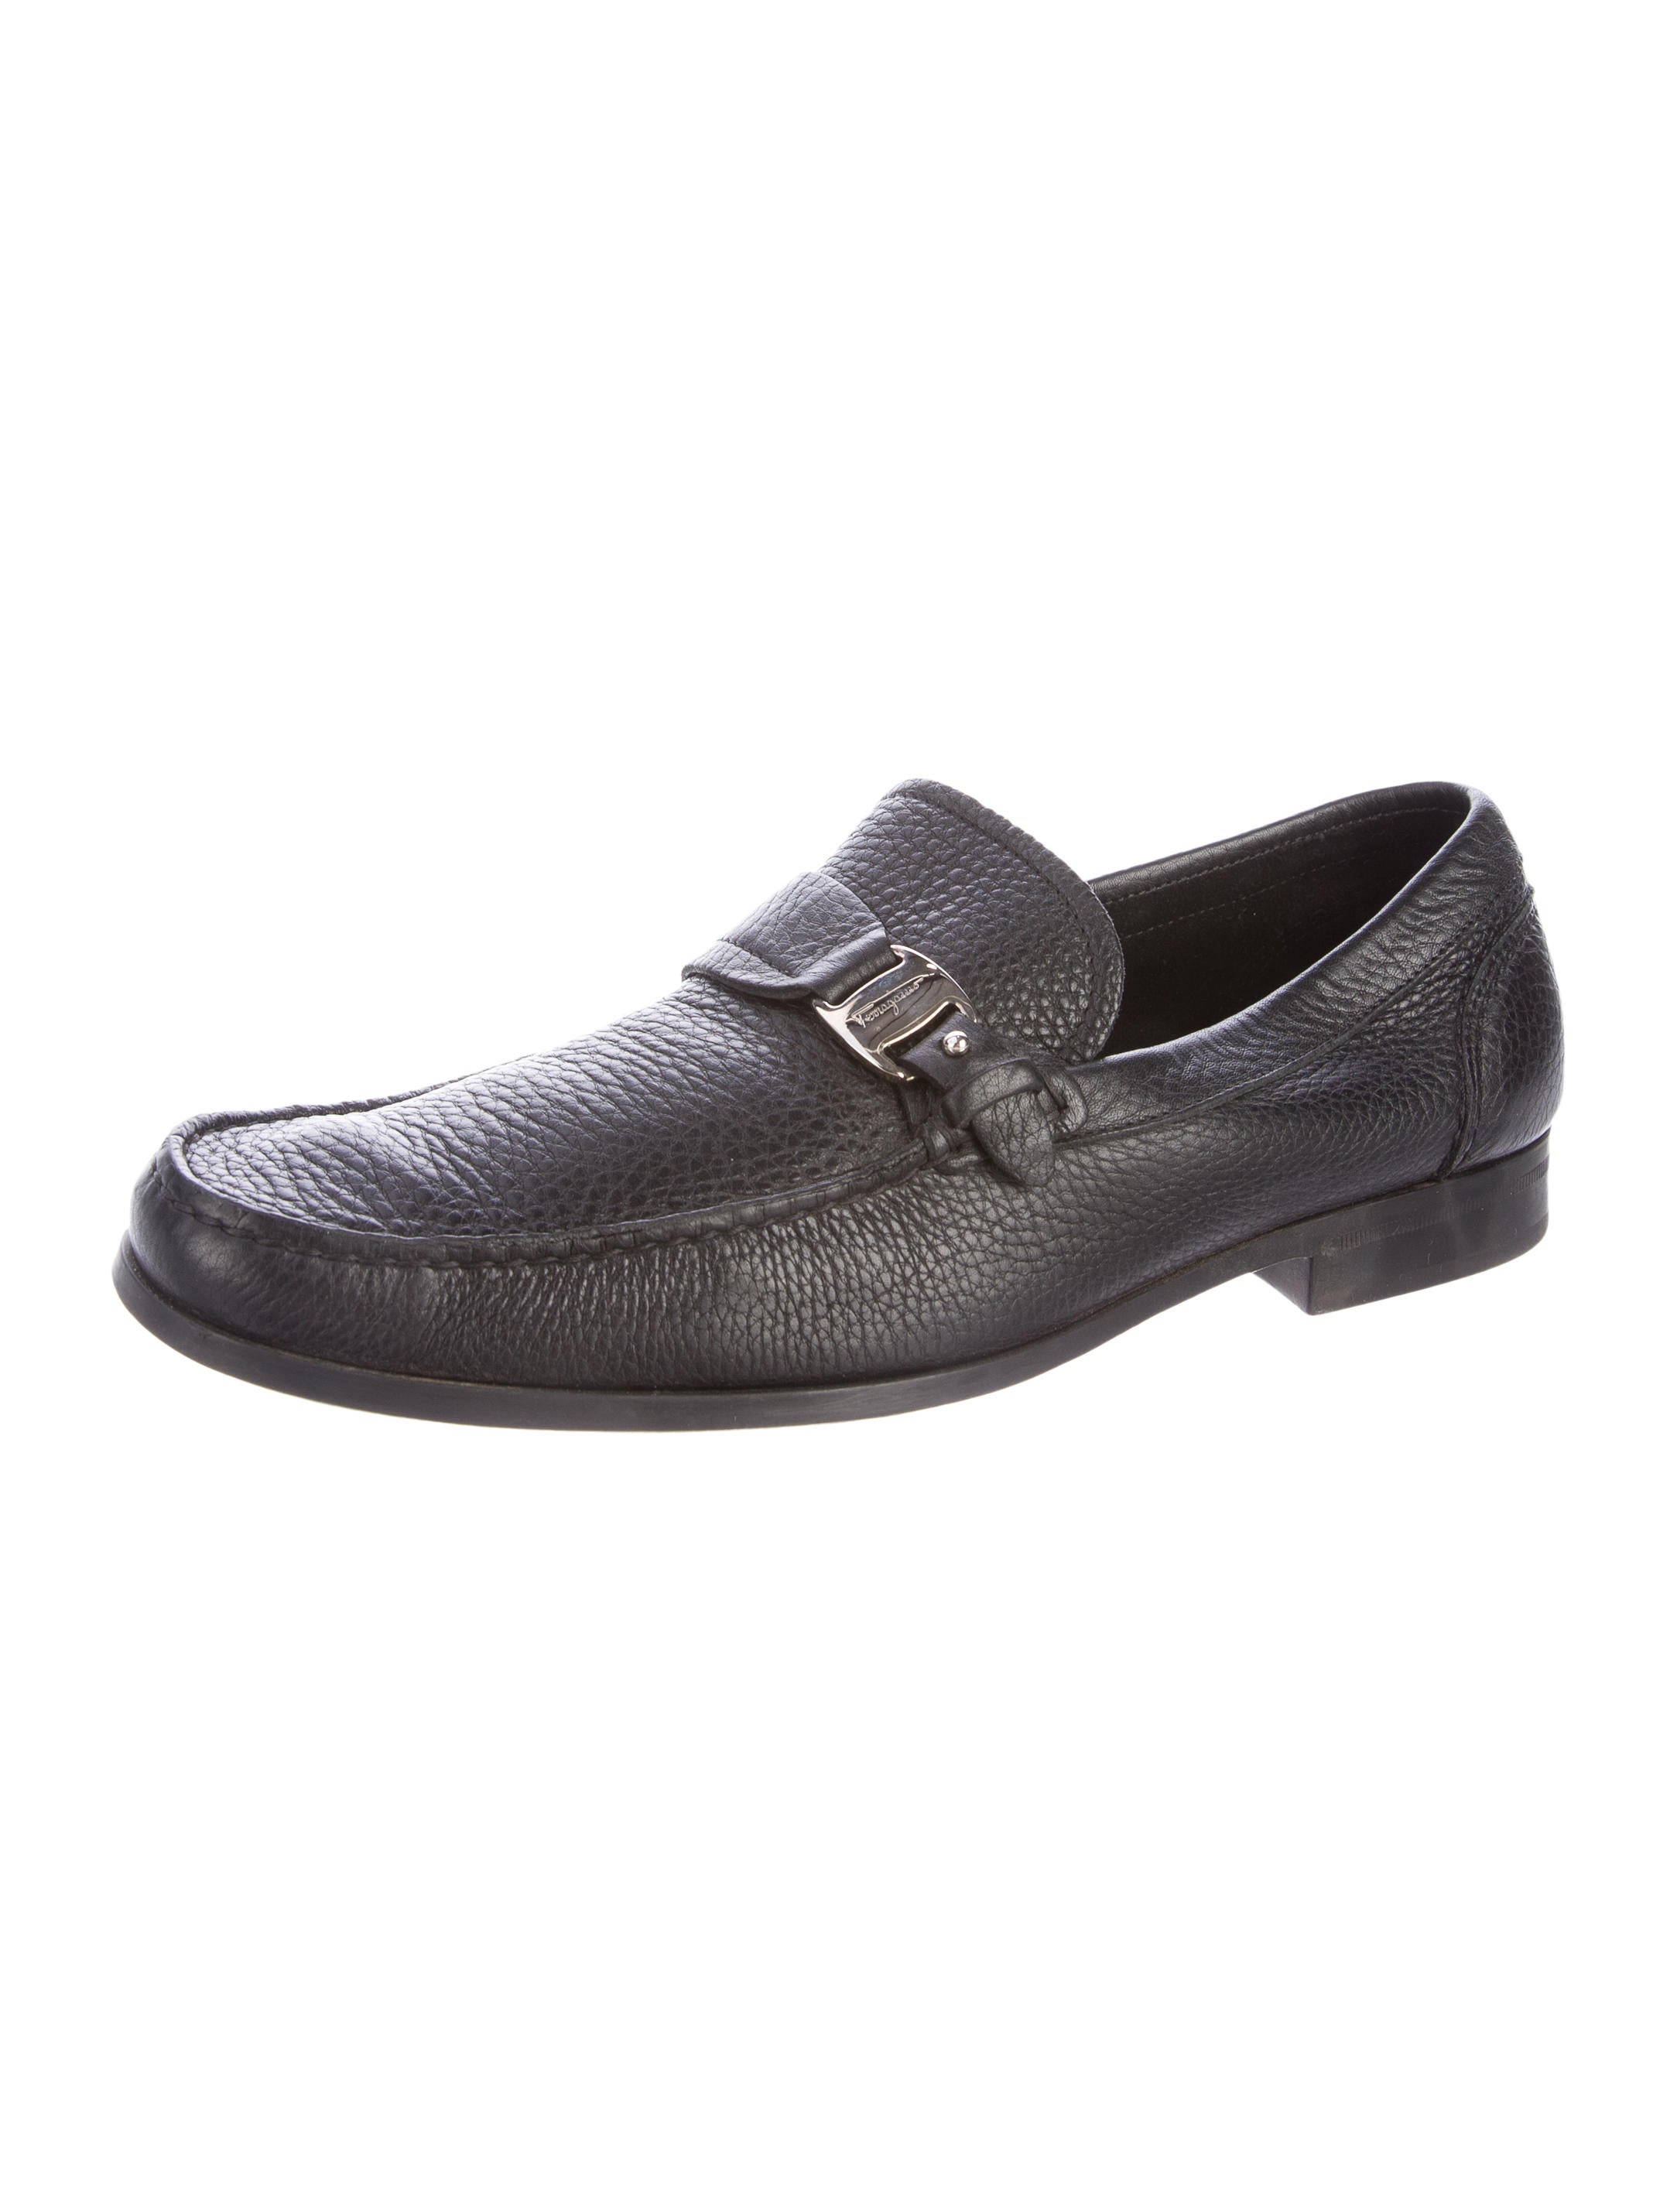 salvatore ferragamo leather dress loafers shoes